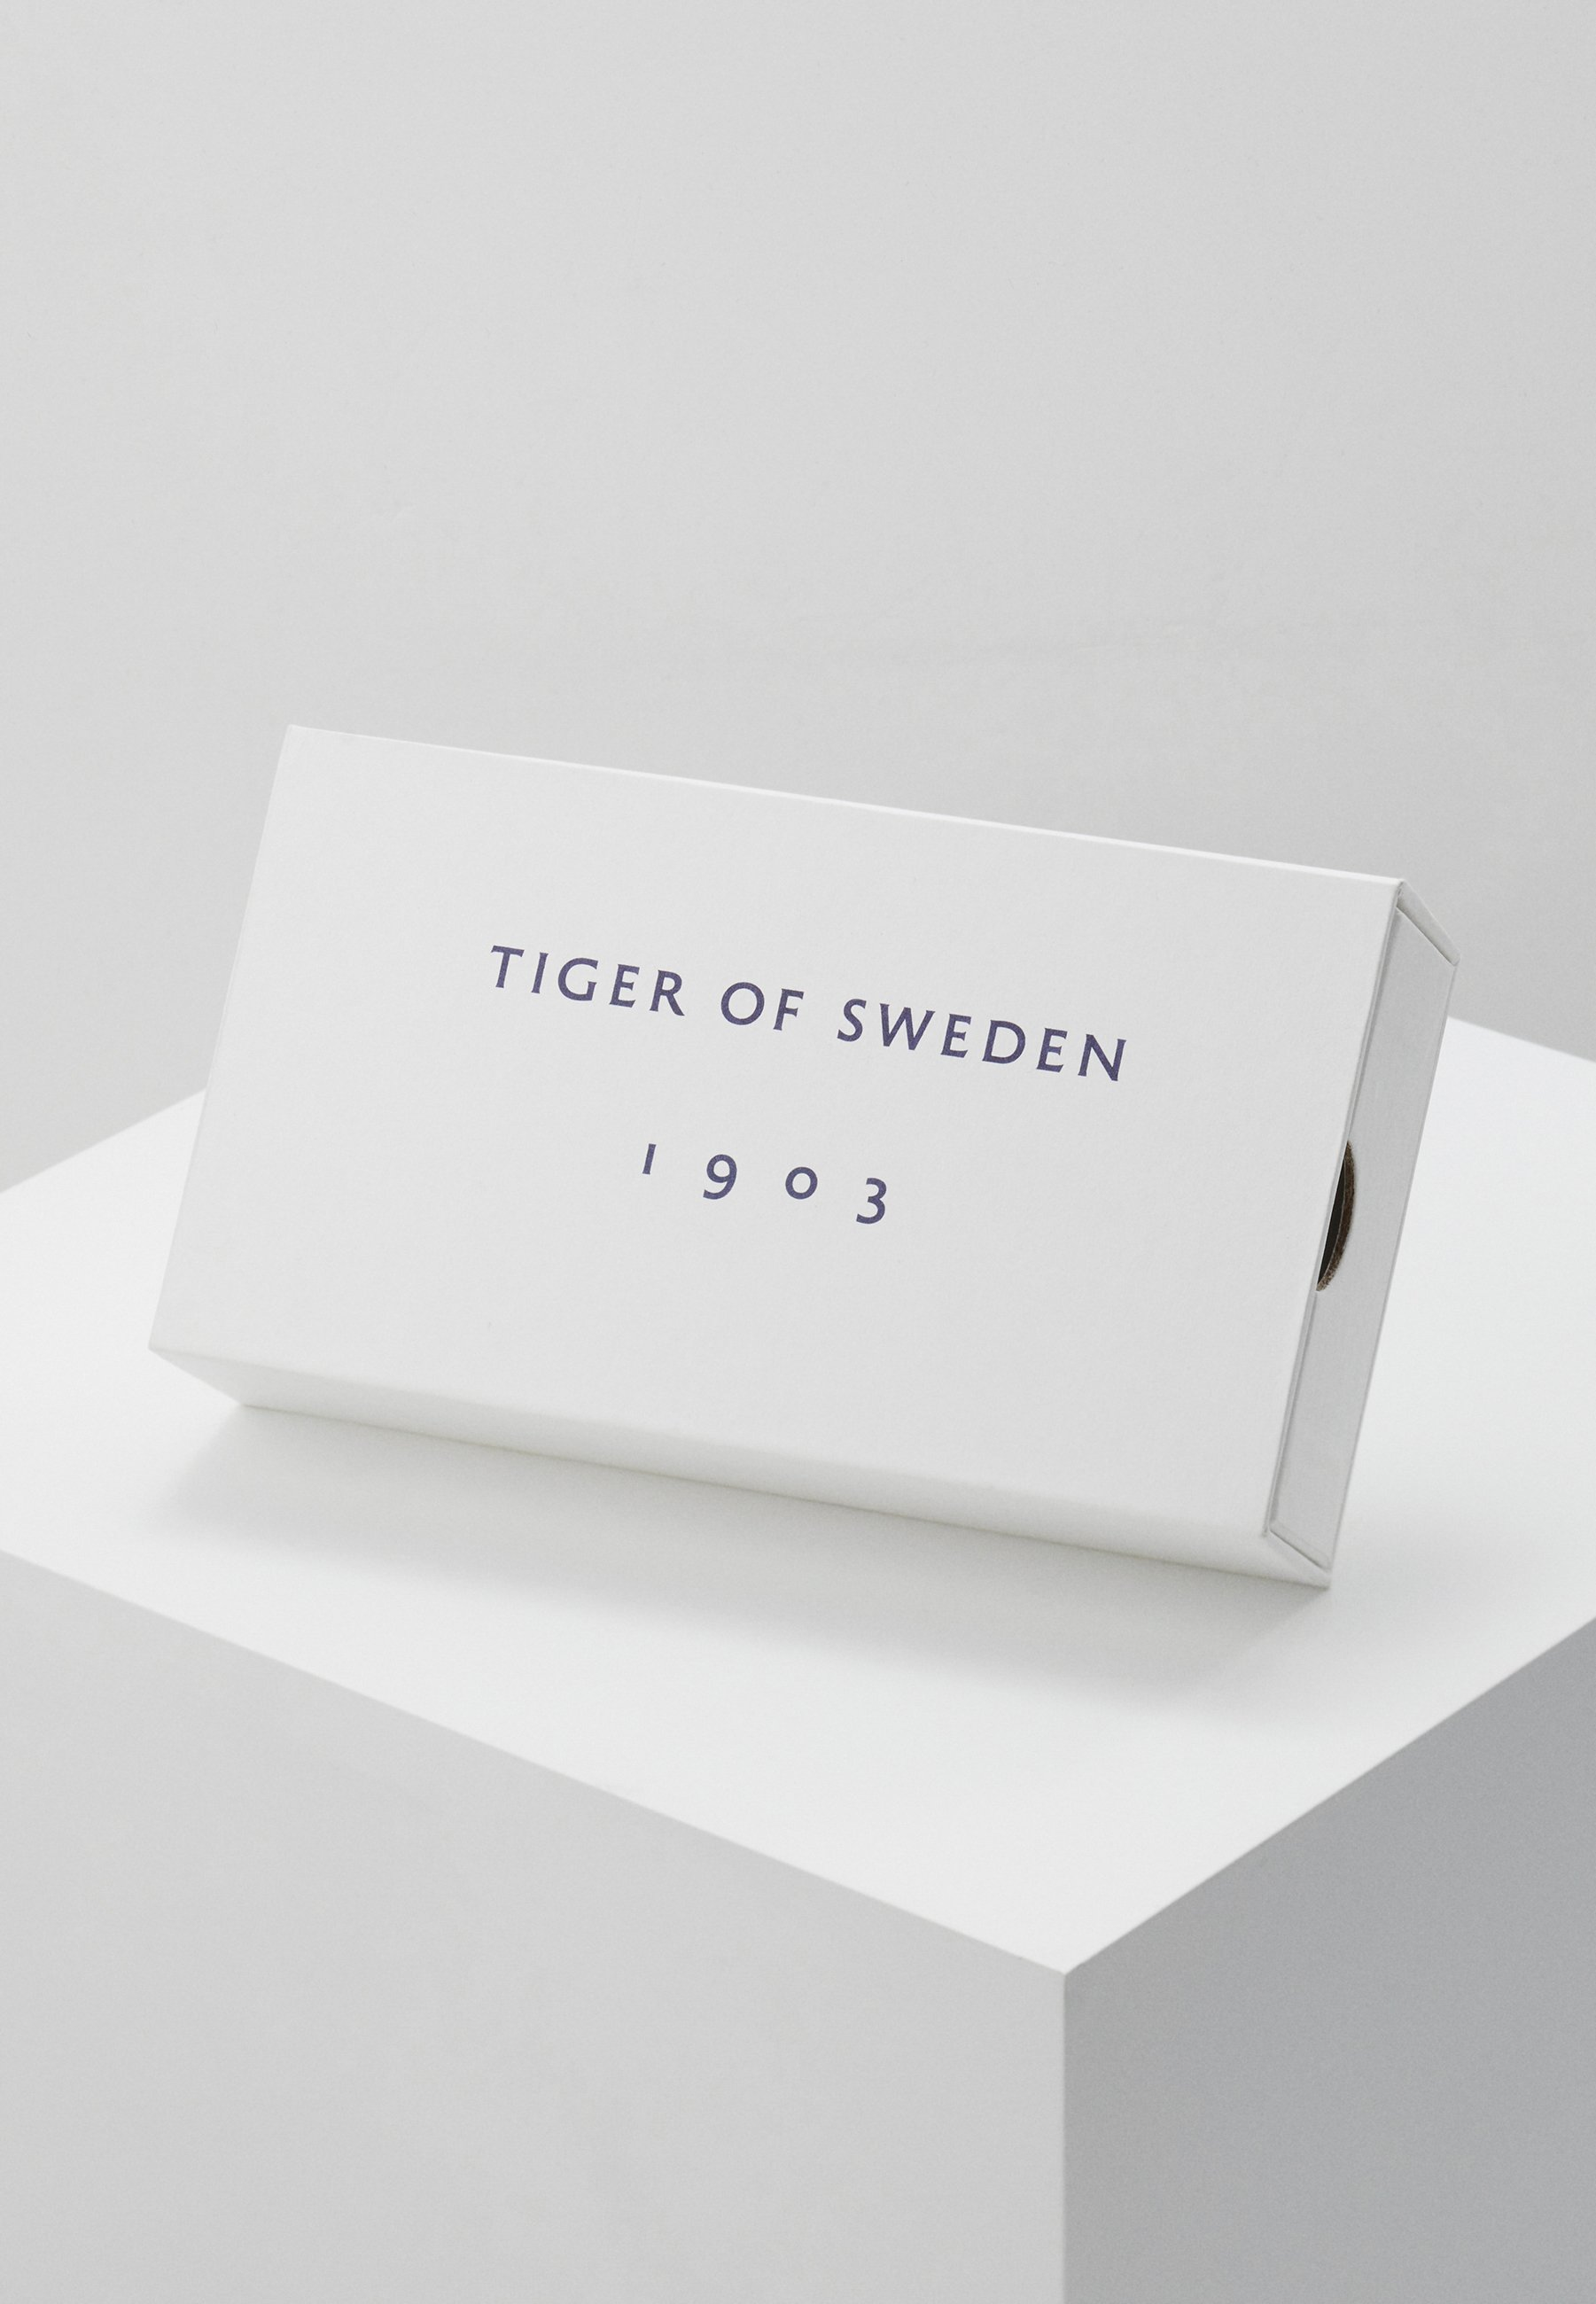 La Mejor Compra Ropa de hombre Tiger of Sweden BARTEL Pajarita pastelblue M1iQEG